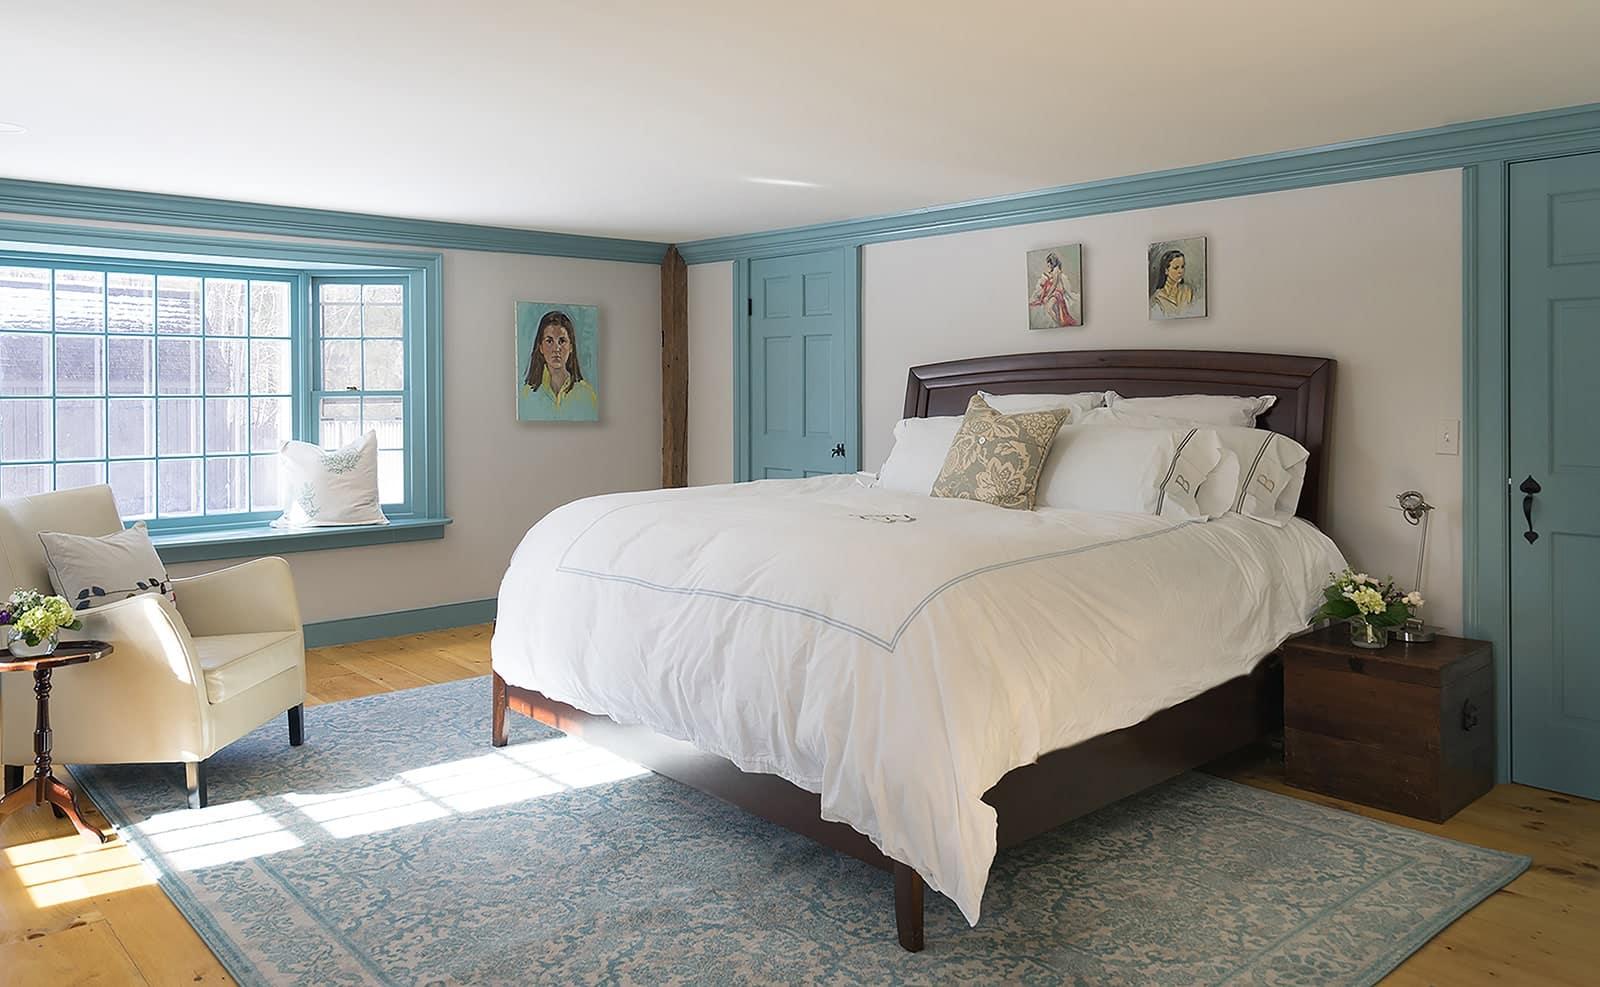 New Hampshire Homestead Historic Interior Bedroom